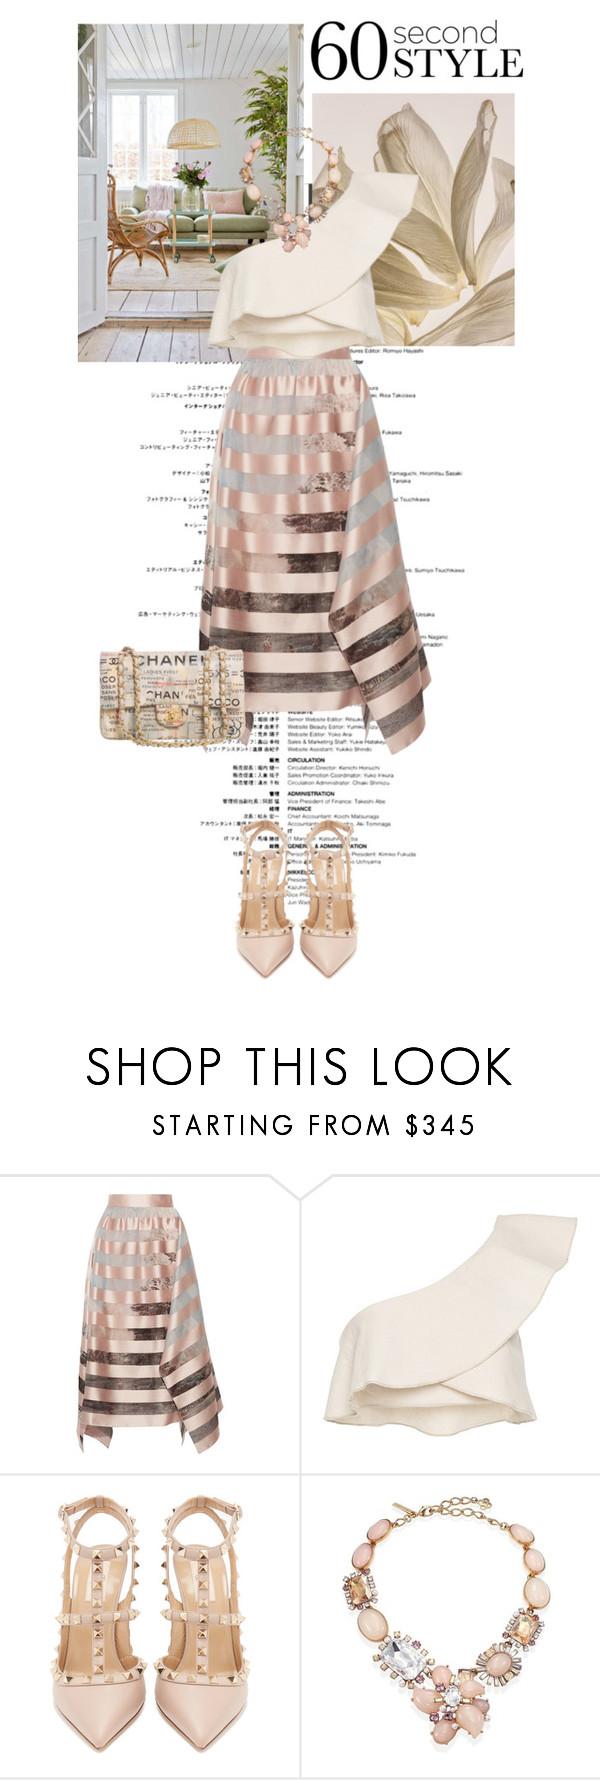 """Asymmetric Skirts pink"" by gizaboudib on Polyvore featuring moda, Fendi, Isabel Marant, Valentino, Oscar de la Renta, Chanel, asymmetricskirts y 60secondstyle"